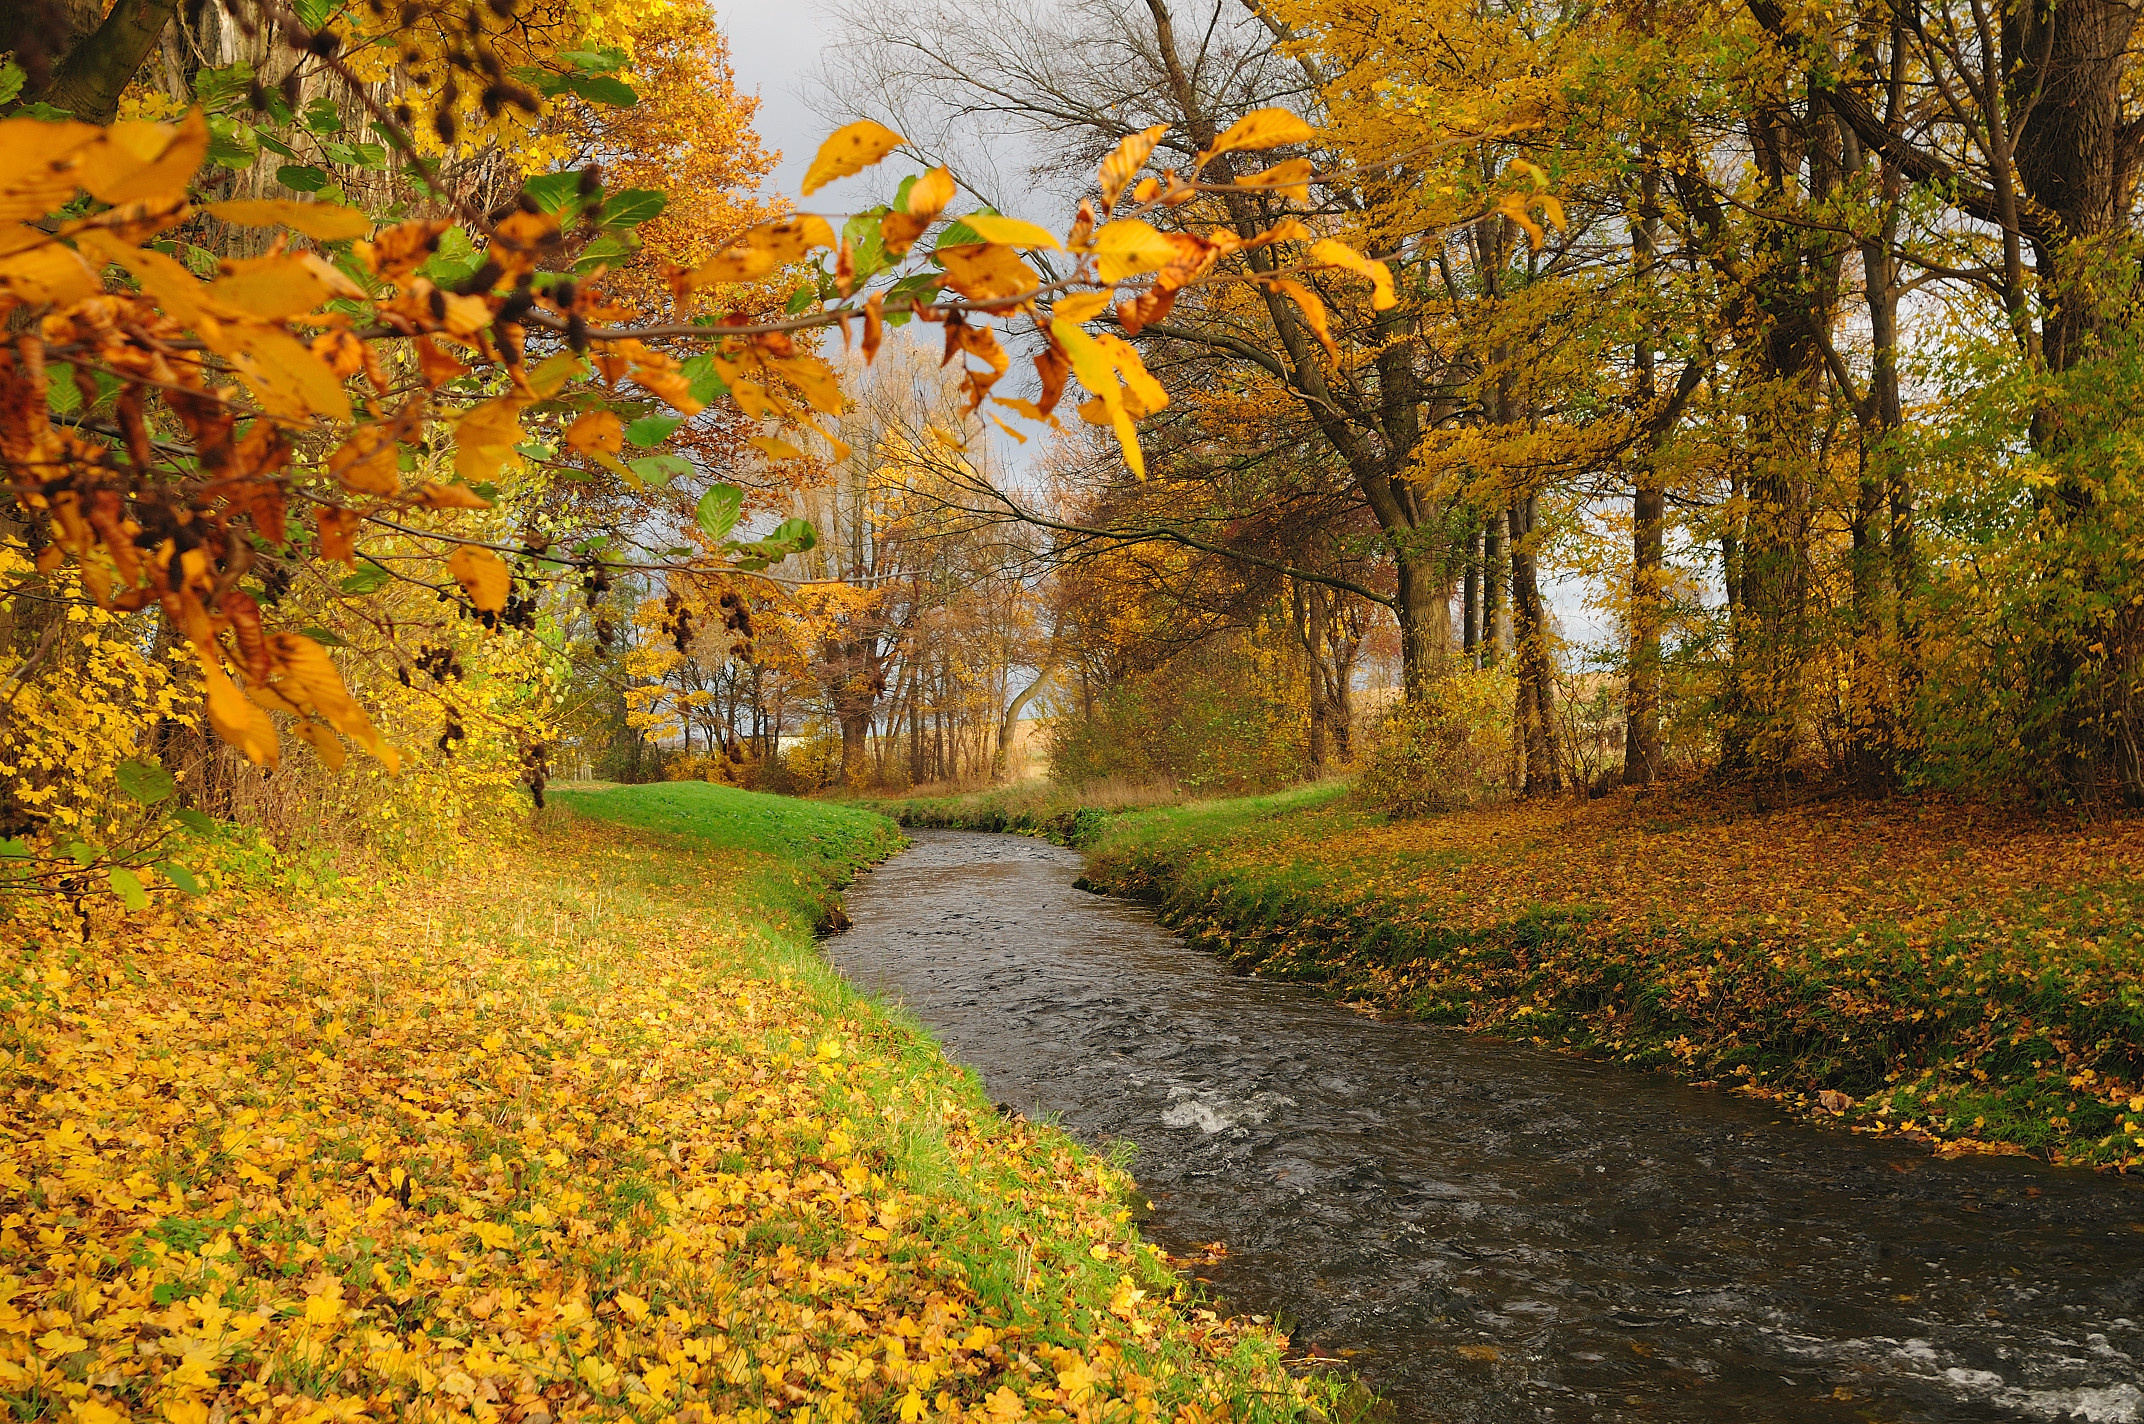 latvian autumn forest river - photo #28